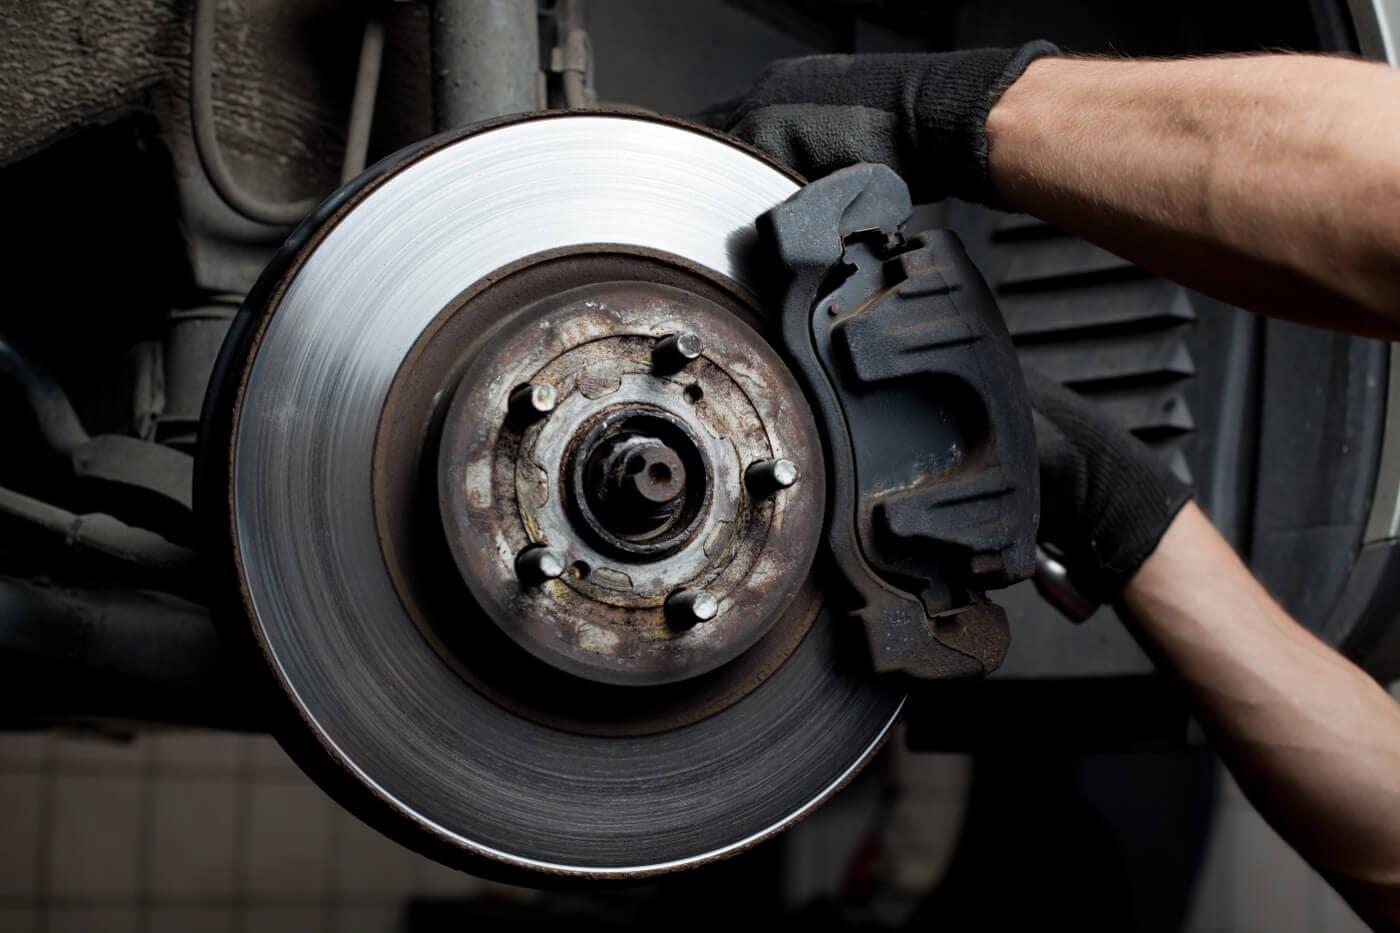 A closeup of car brakes